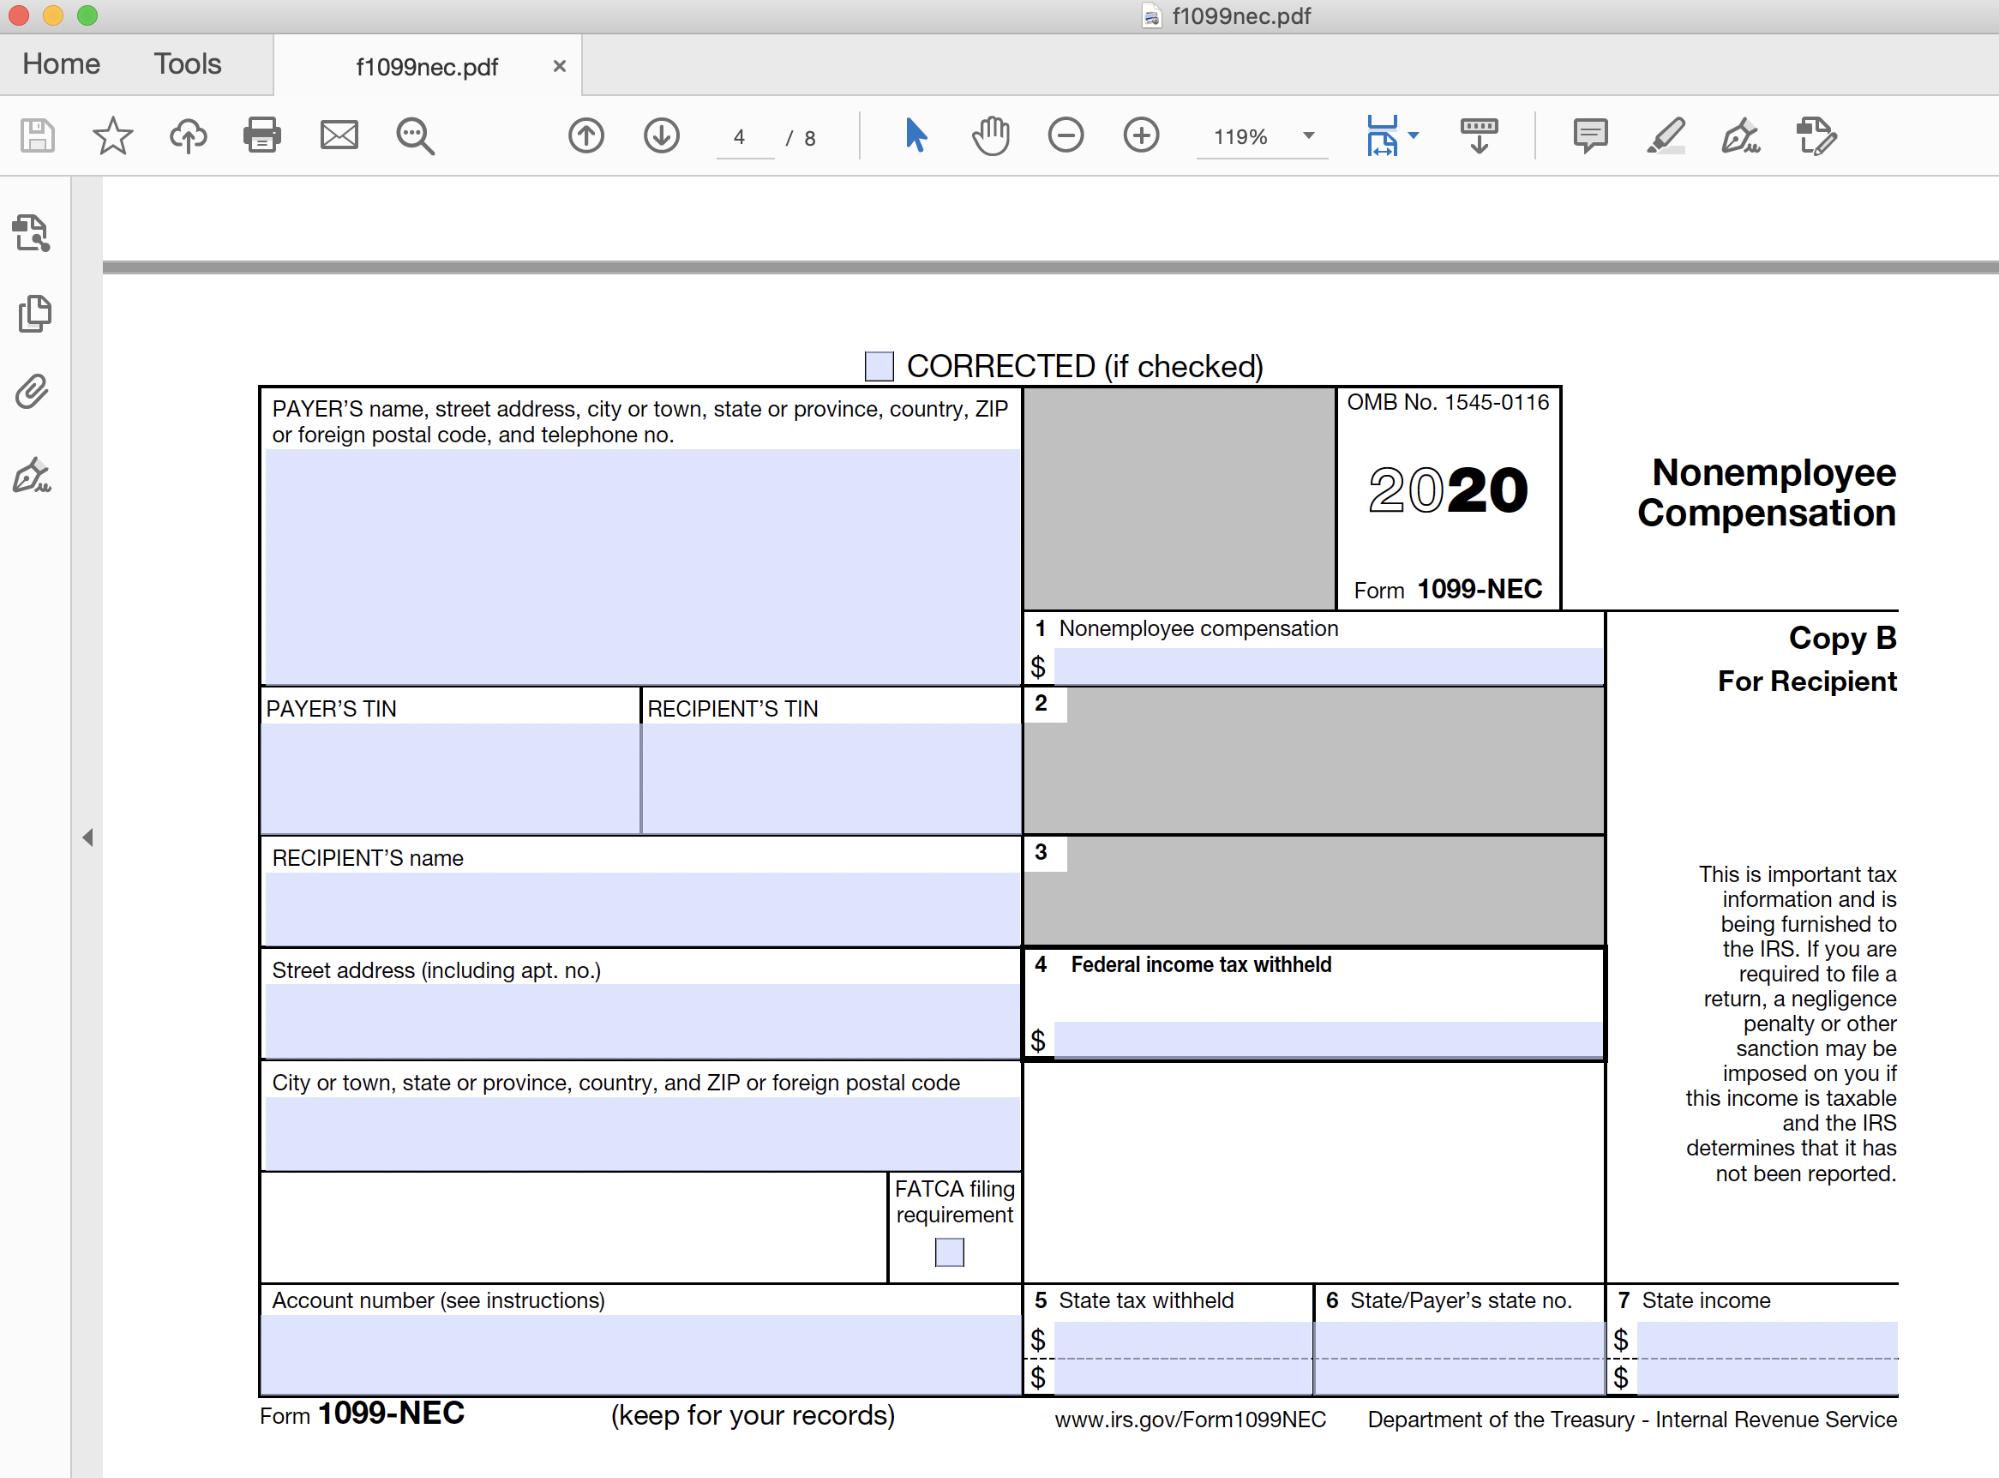 pixel-perfect PDF form